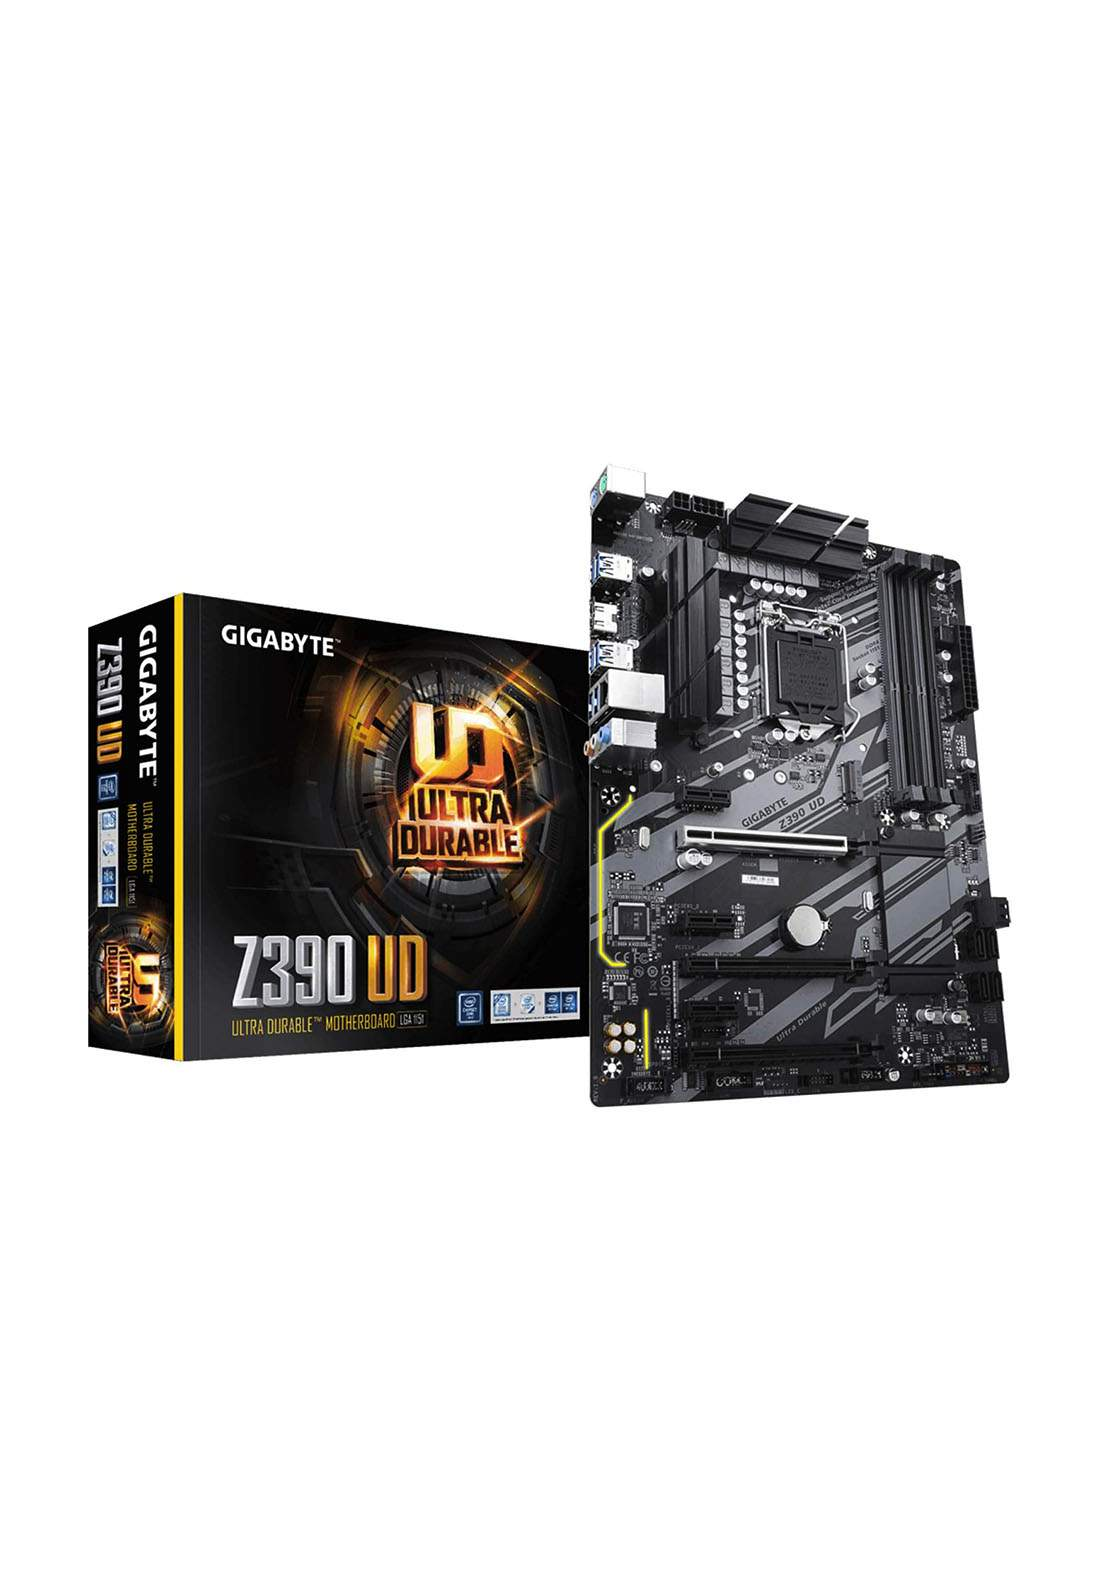 Gigabyte Z390 Ud Intel Lga115 Motherboard-Black لوحة الام